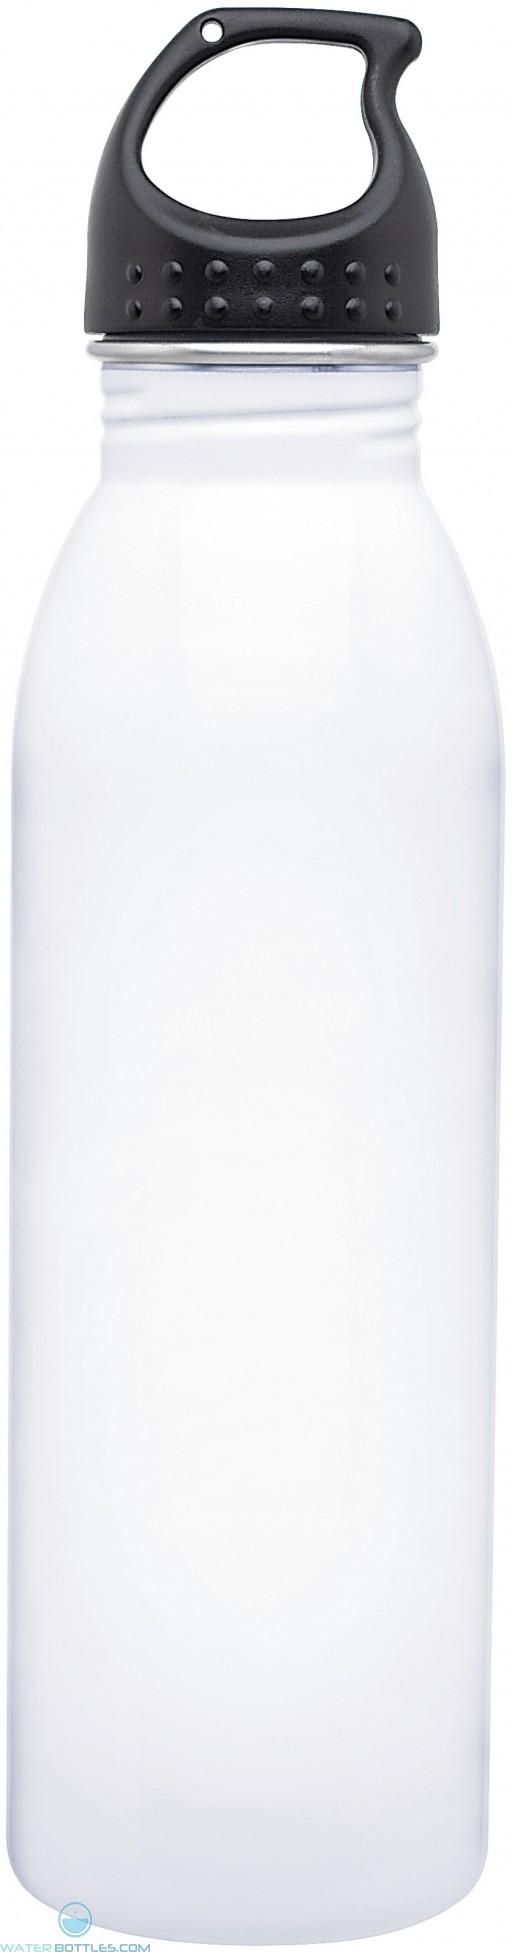 H2Go Solus Water Bottles   24 oz - White